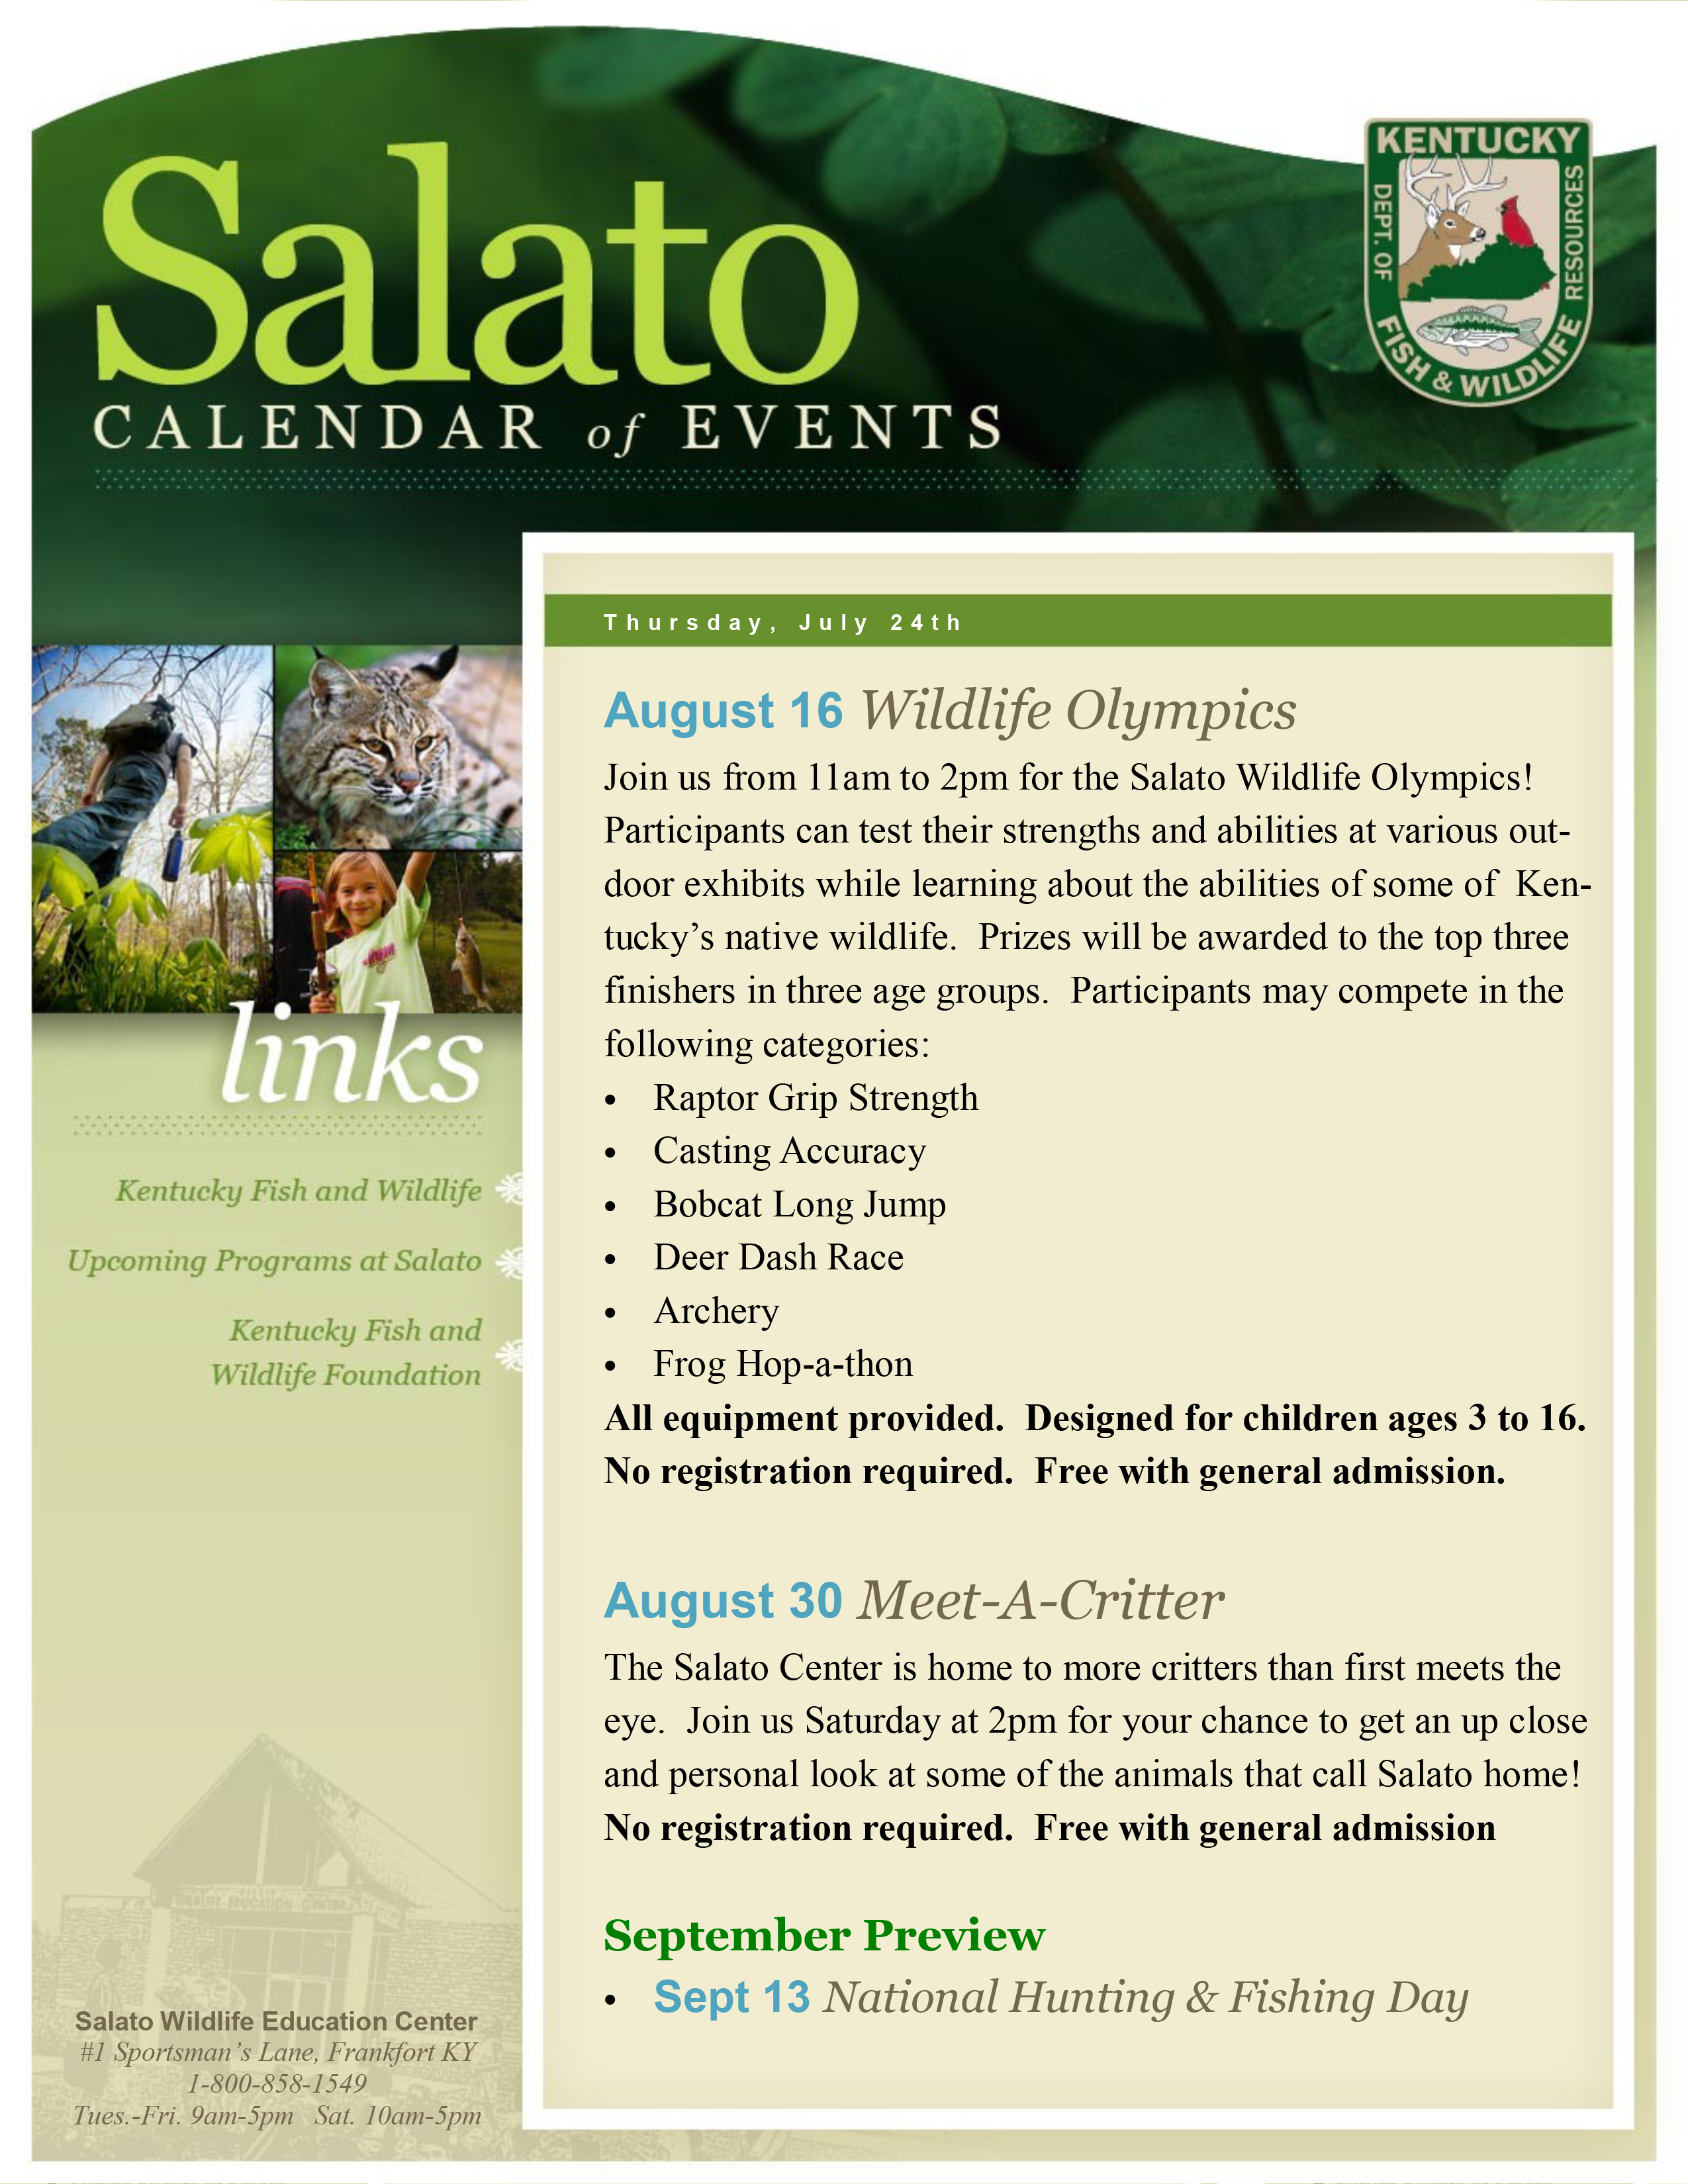 community news events capital living salado coe 2014